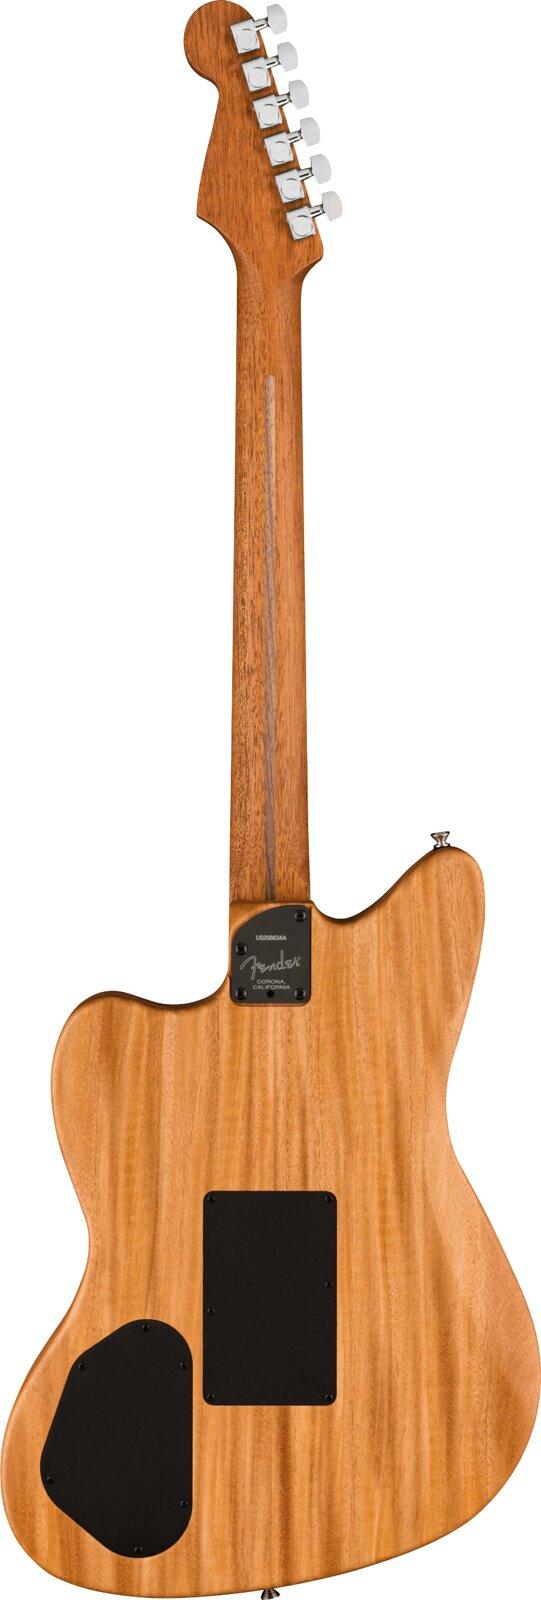 Fender American Acoustasonic Jazzmaster Tungsen Ebony Fingerboard : photo 2